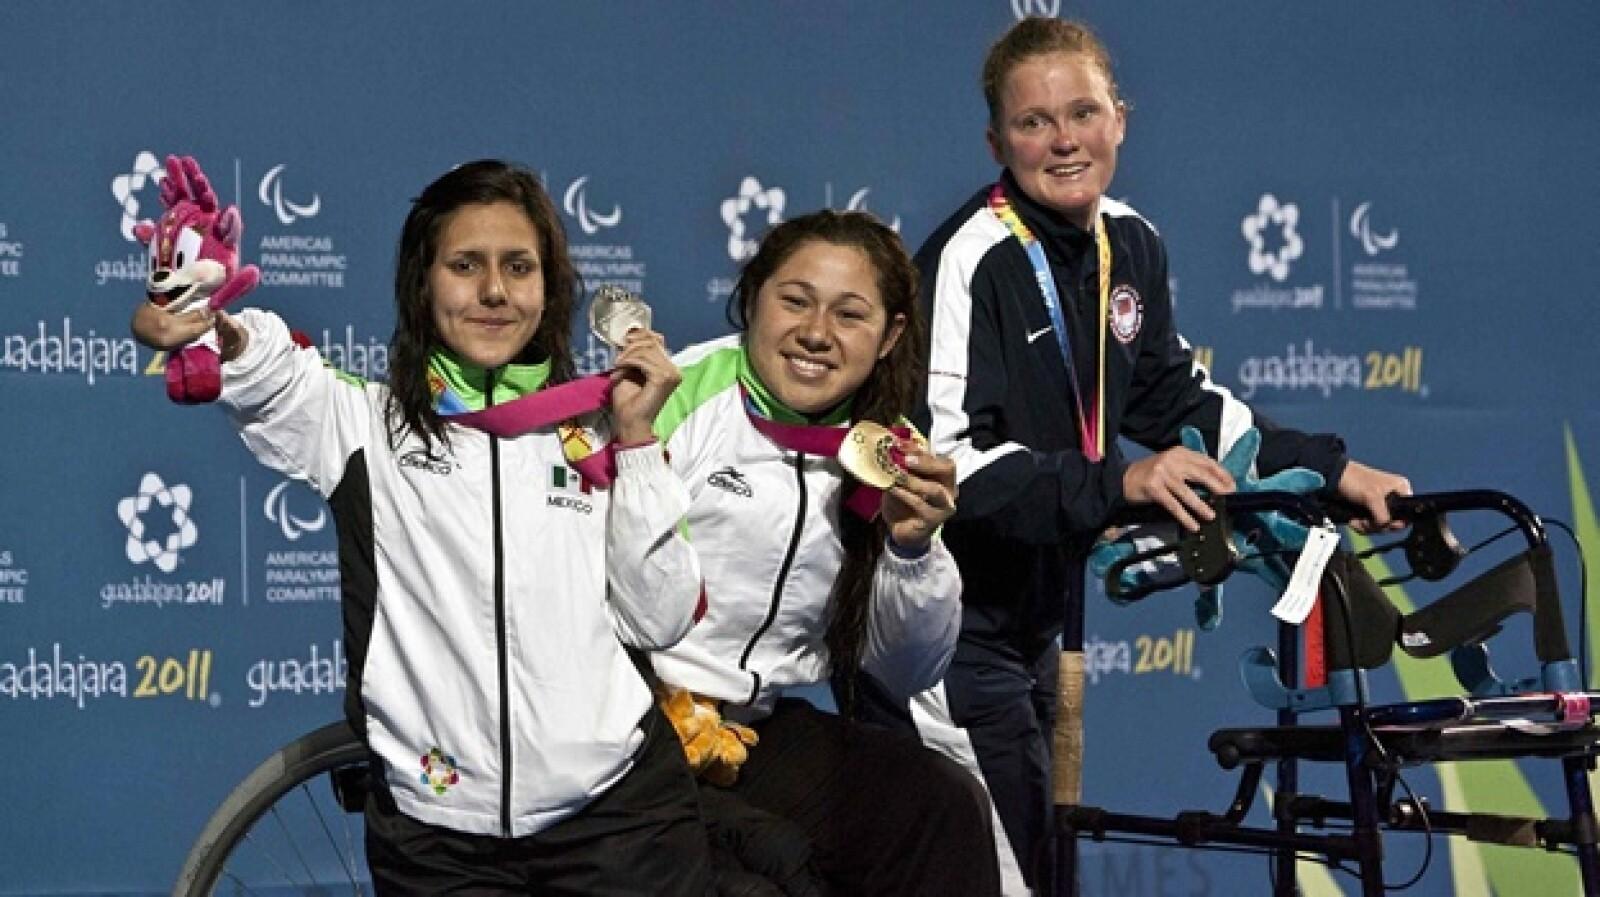 Doramitzi Gonzalez de Mexico medalla de oro